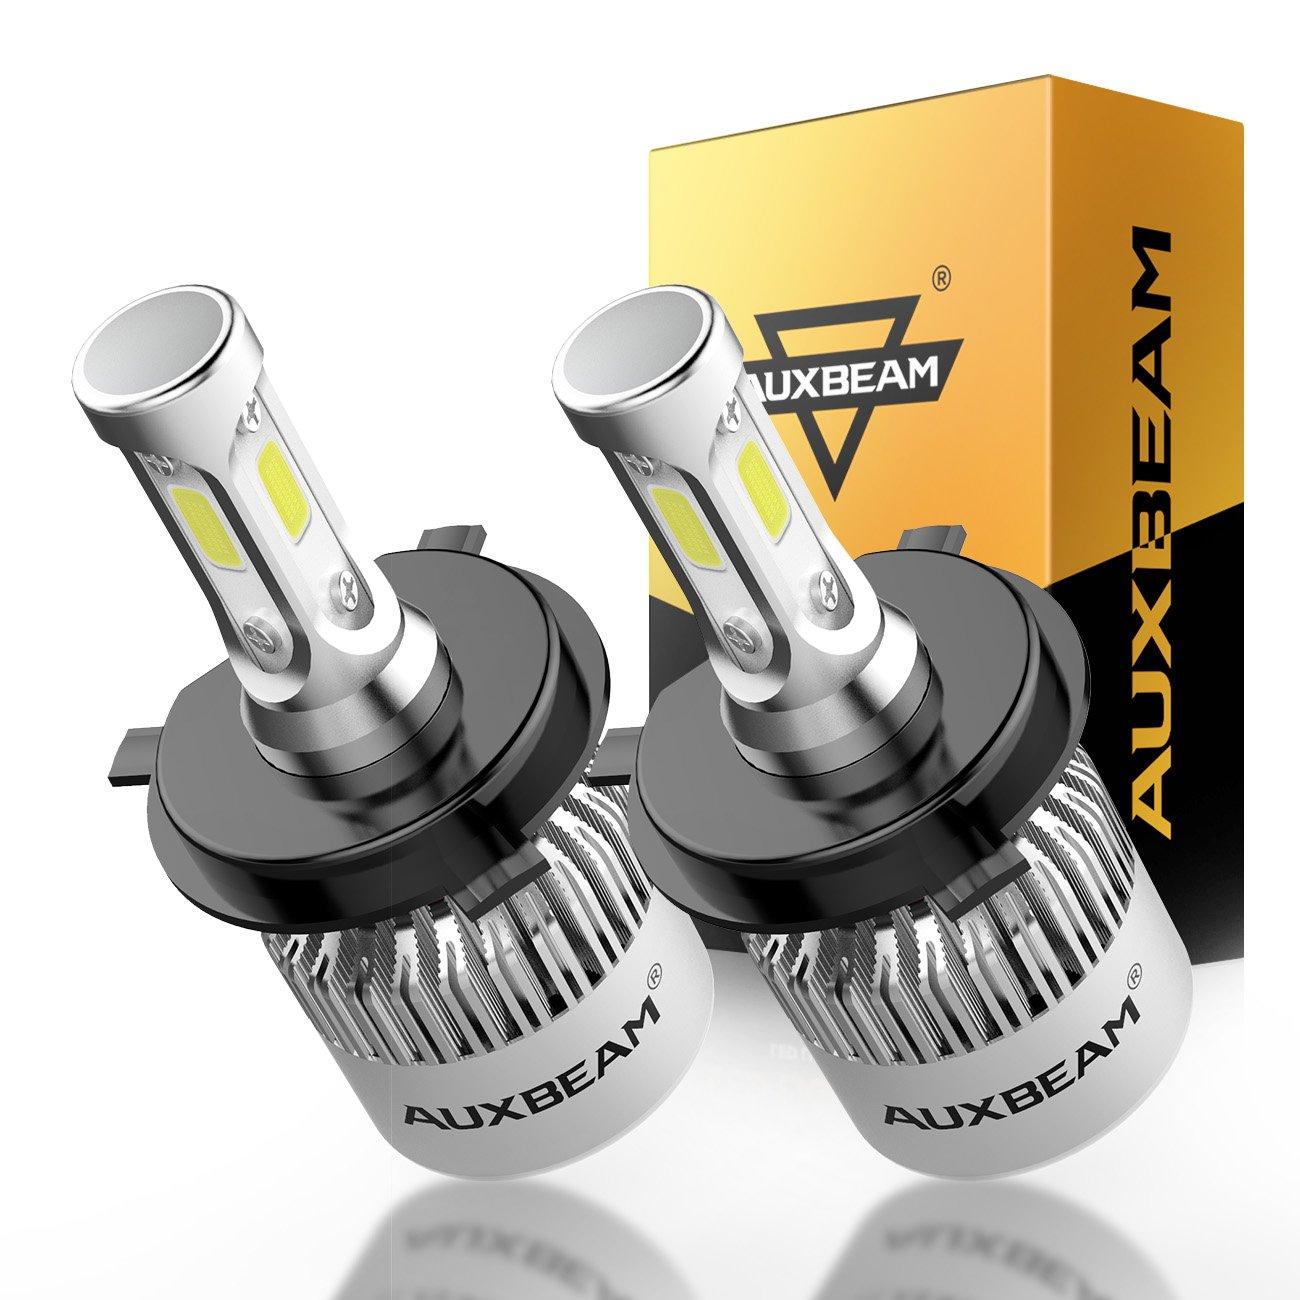 Auxbeam LED Headlight Bulbs F-S2 Series LED Headlights with 2 Pcs of H4 LED Conversion Kits72W 8000lm Hi-Lo Beam